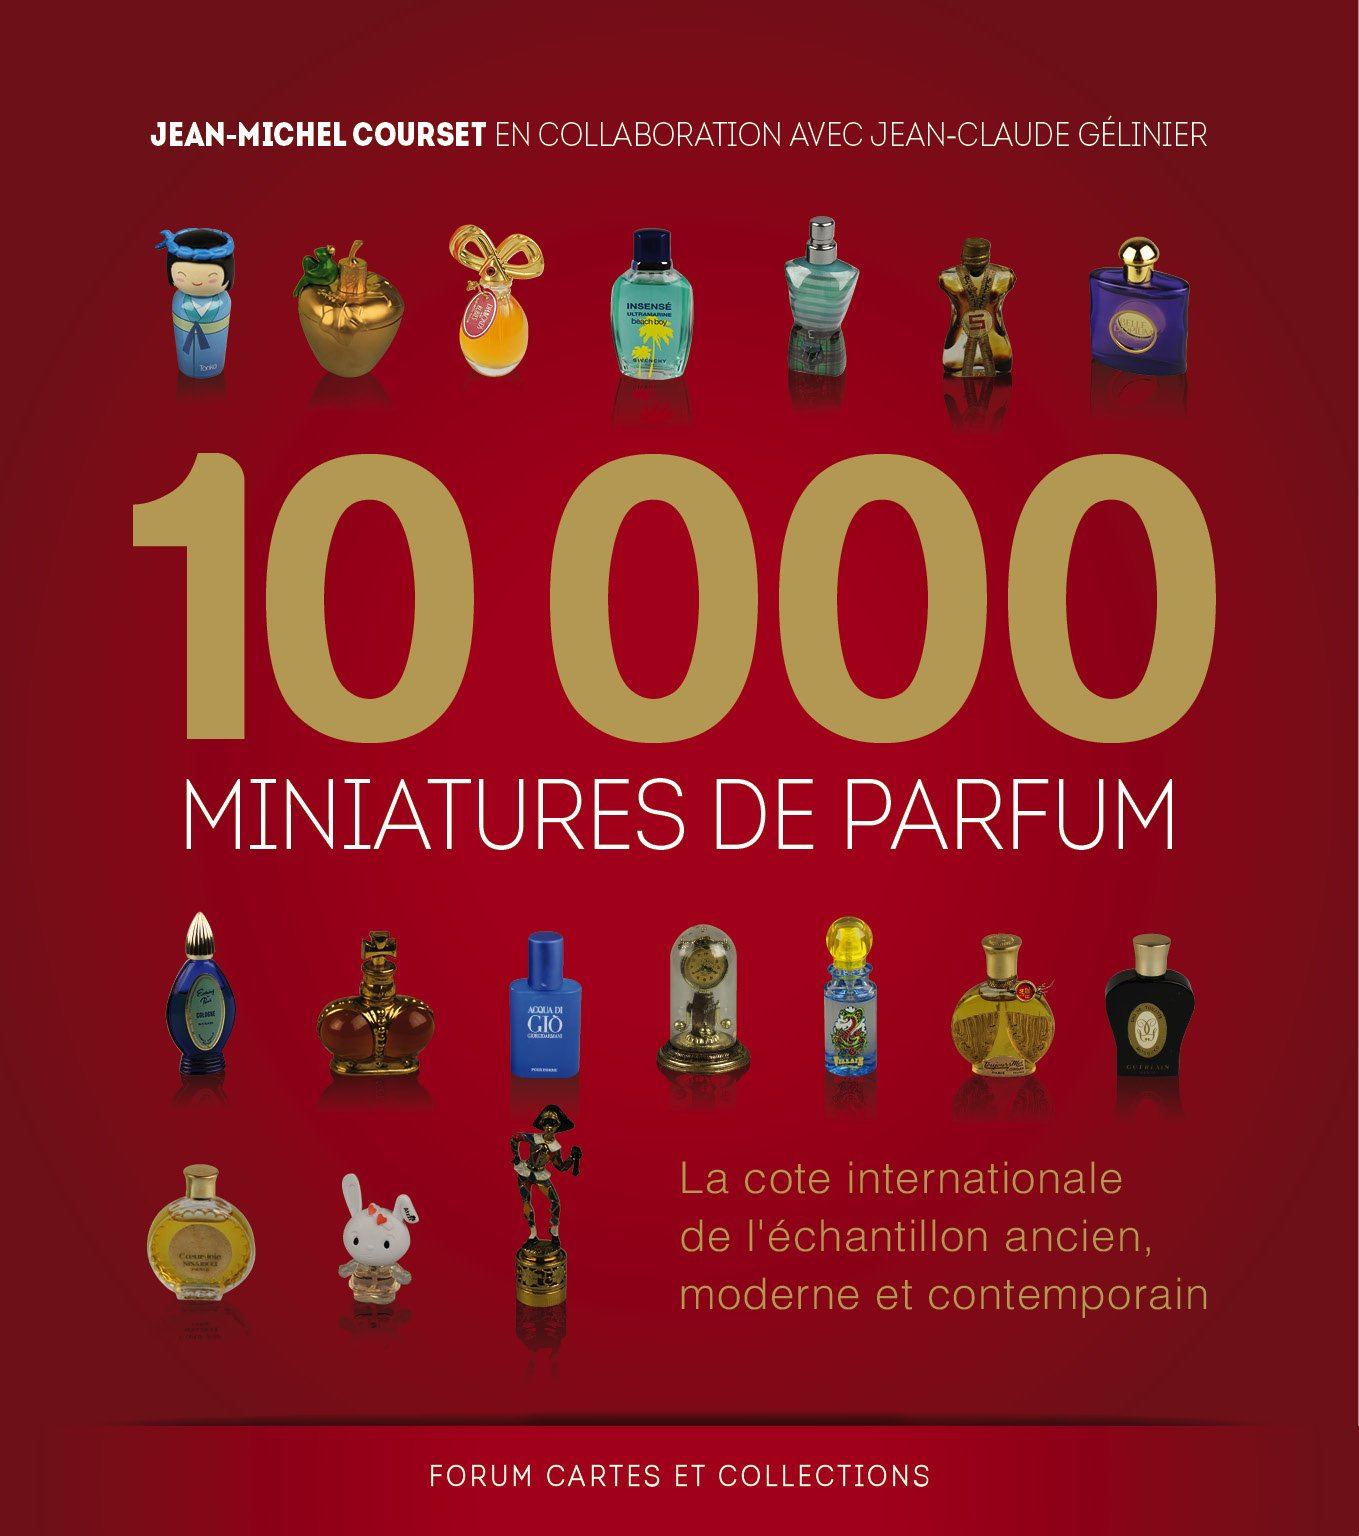 10000 miniatures 1.jpg